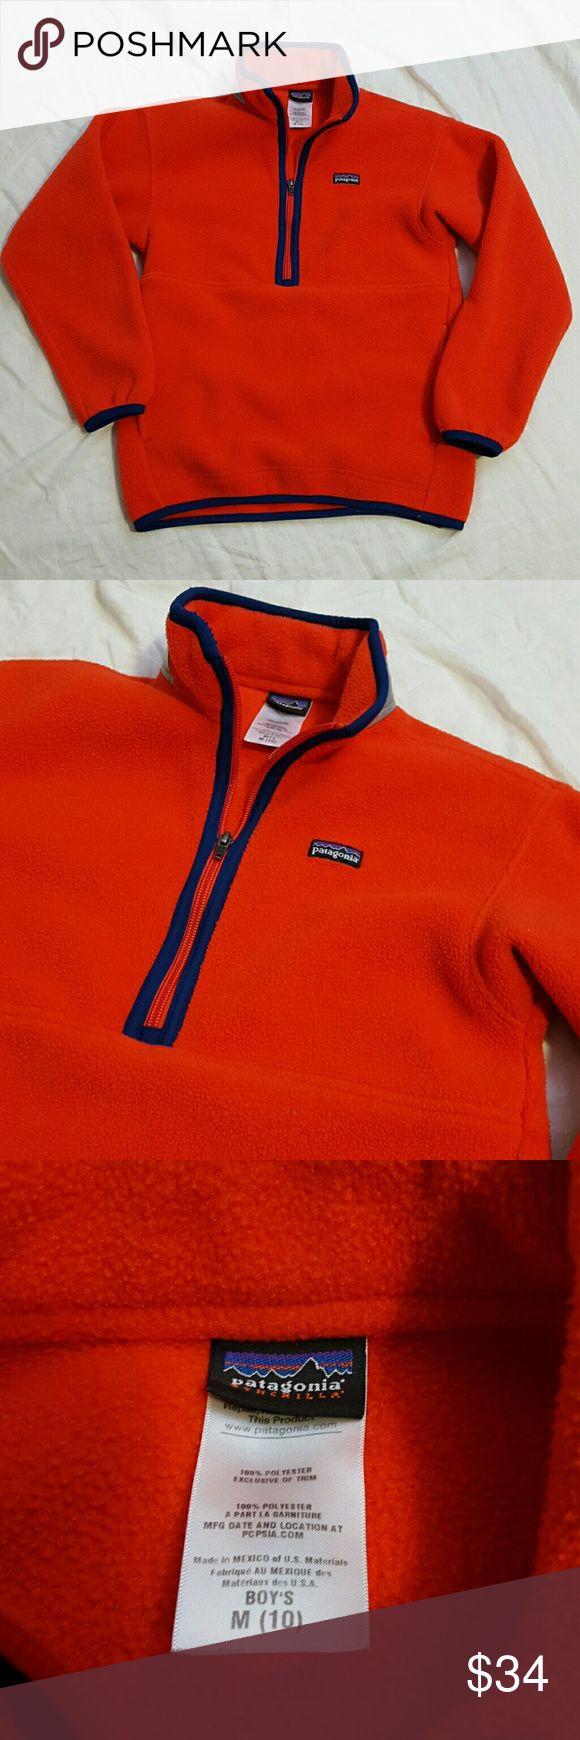 Patagonia Synchilla Boys Orange Pullover Fleece Patagonia Synchilla fleece Bright orange pullover Size: boys Medium (10) Great Condition Patagonia Jackets & Coats